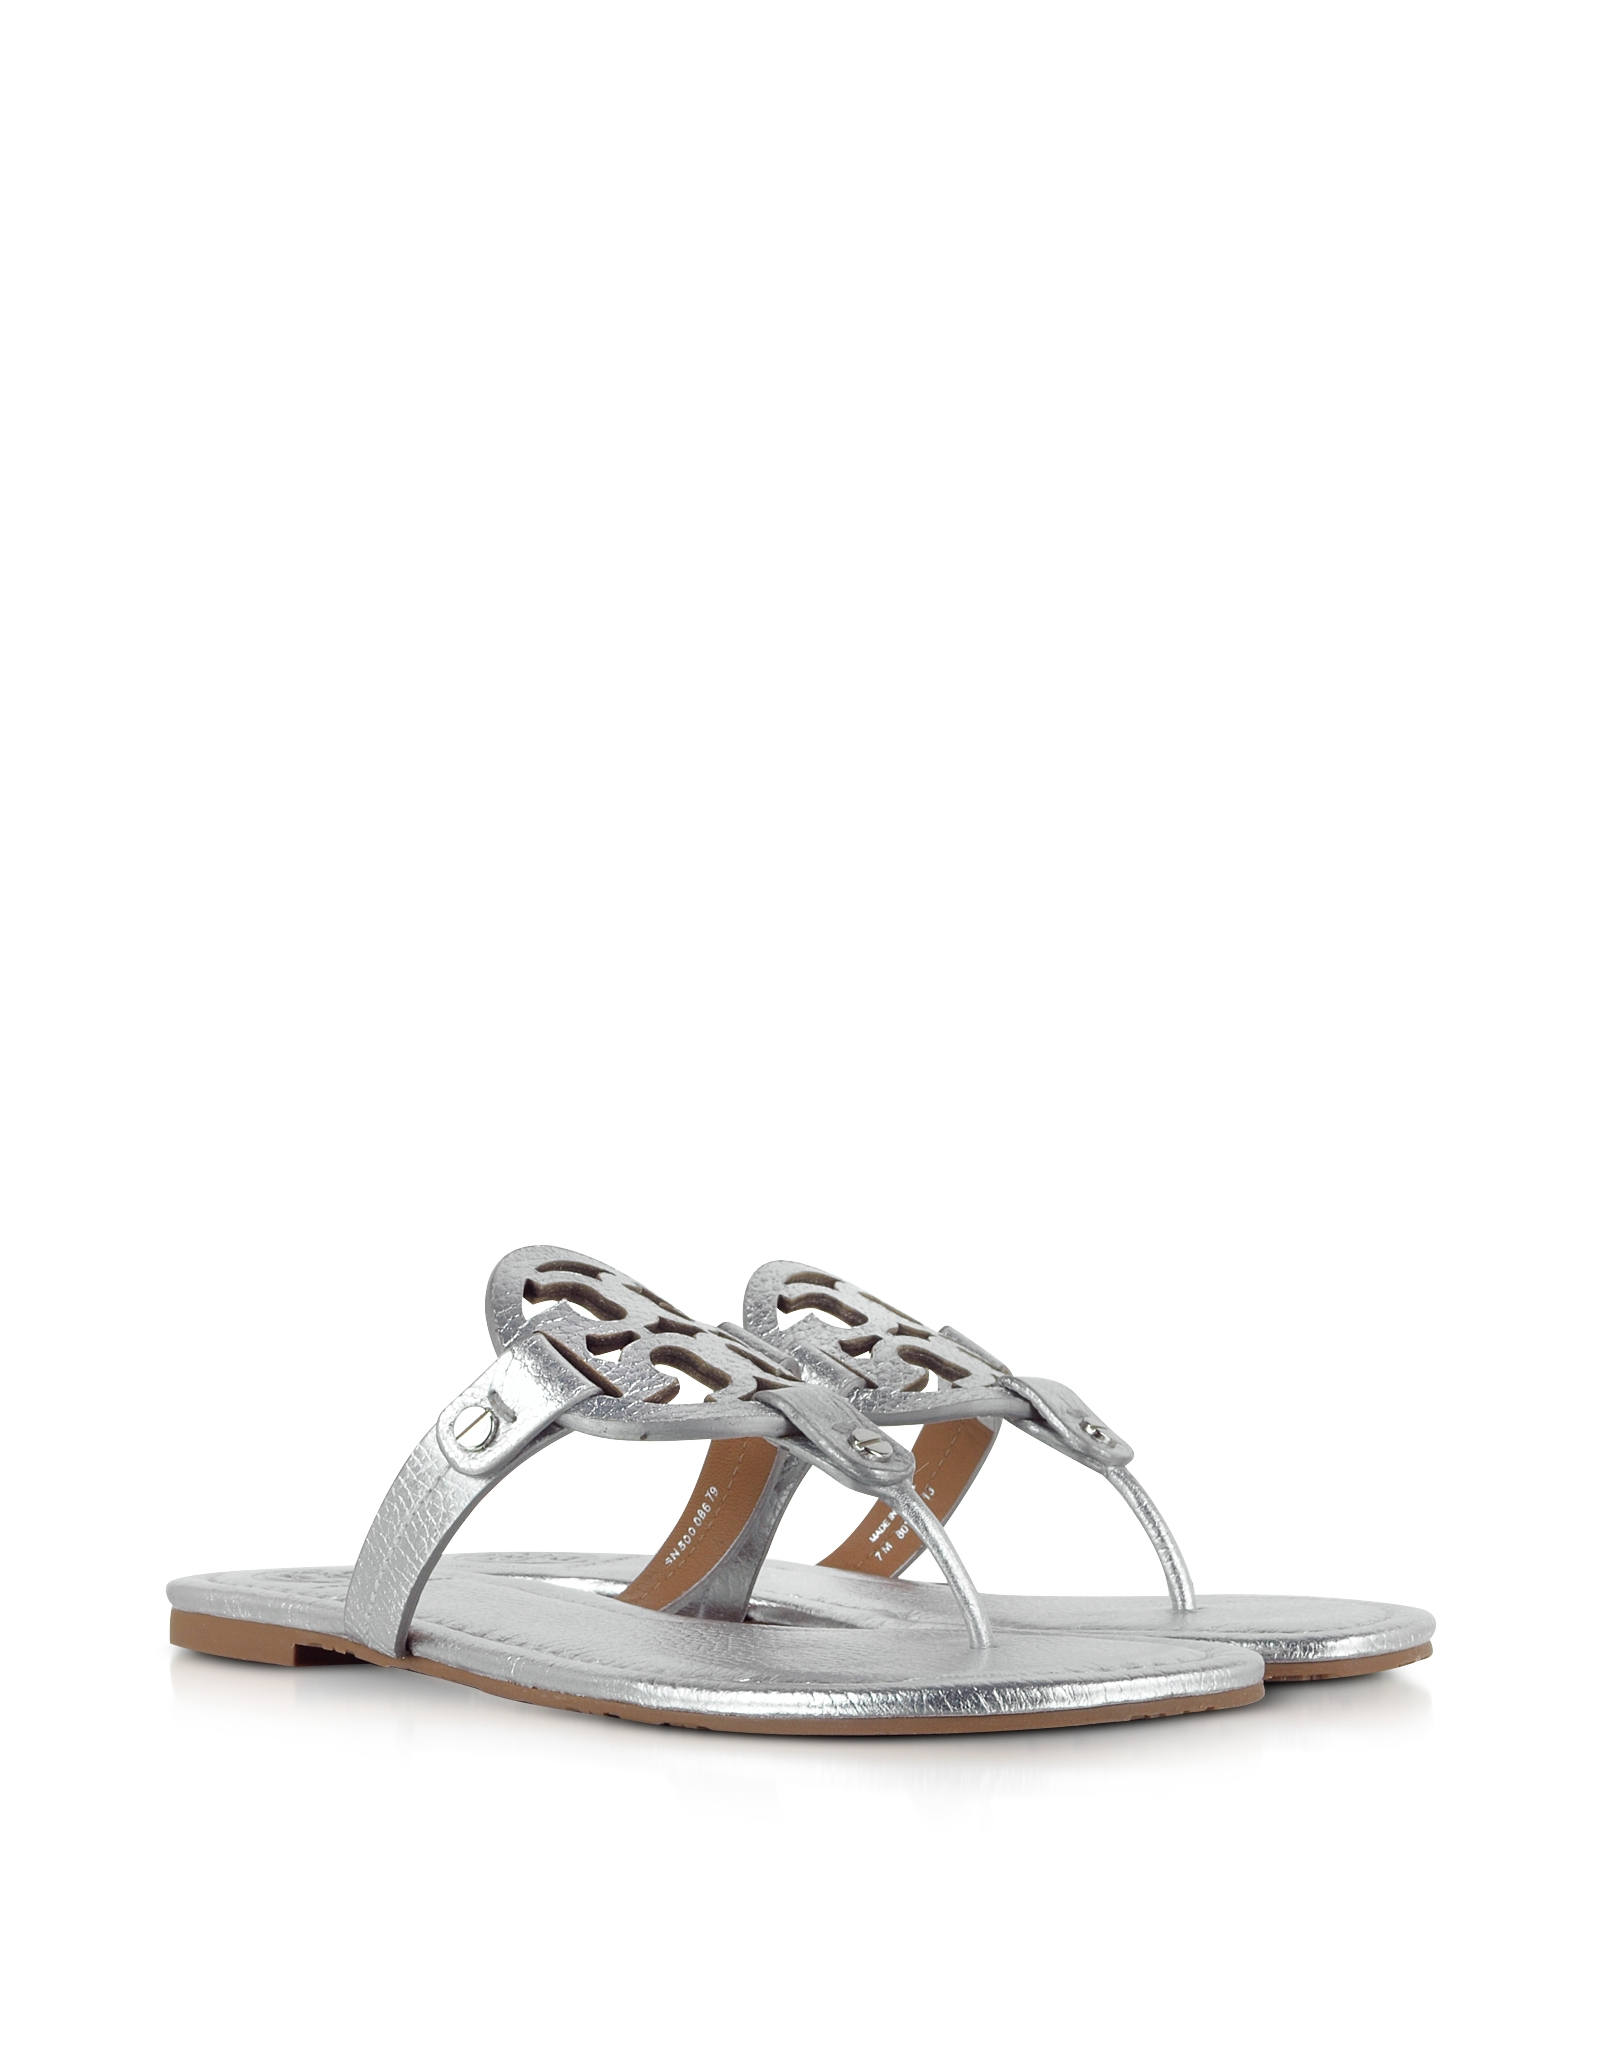 34ff999b03250 Lyst - Tory Burch Miller Metallic Silver Leather Sandal in Metallic